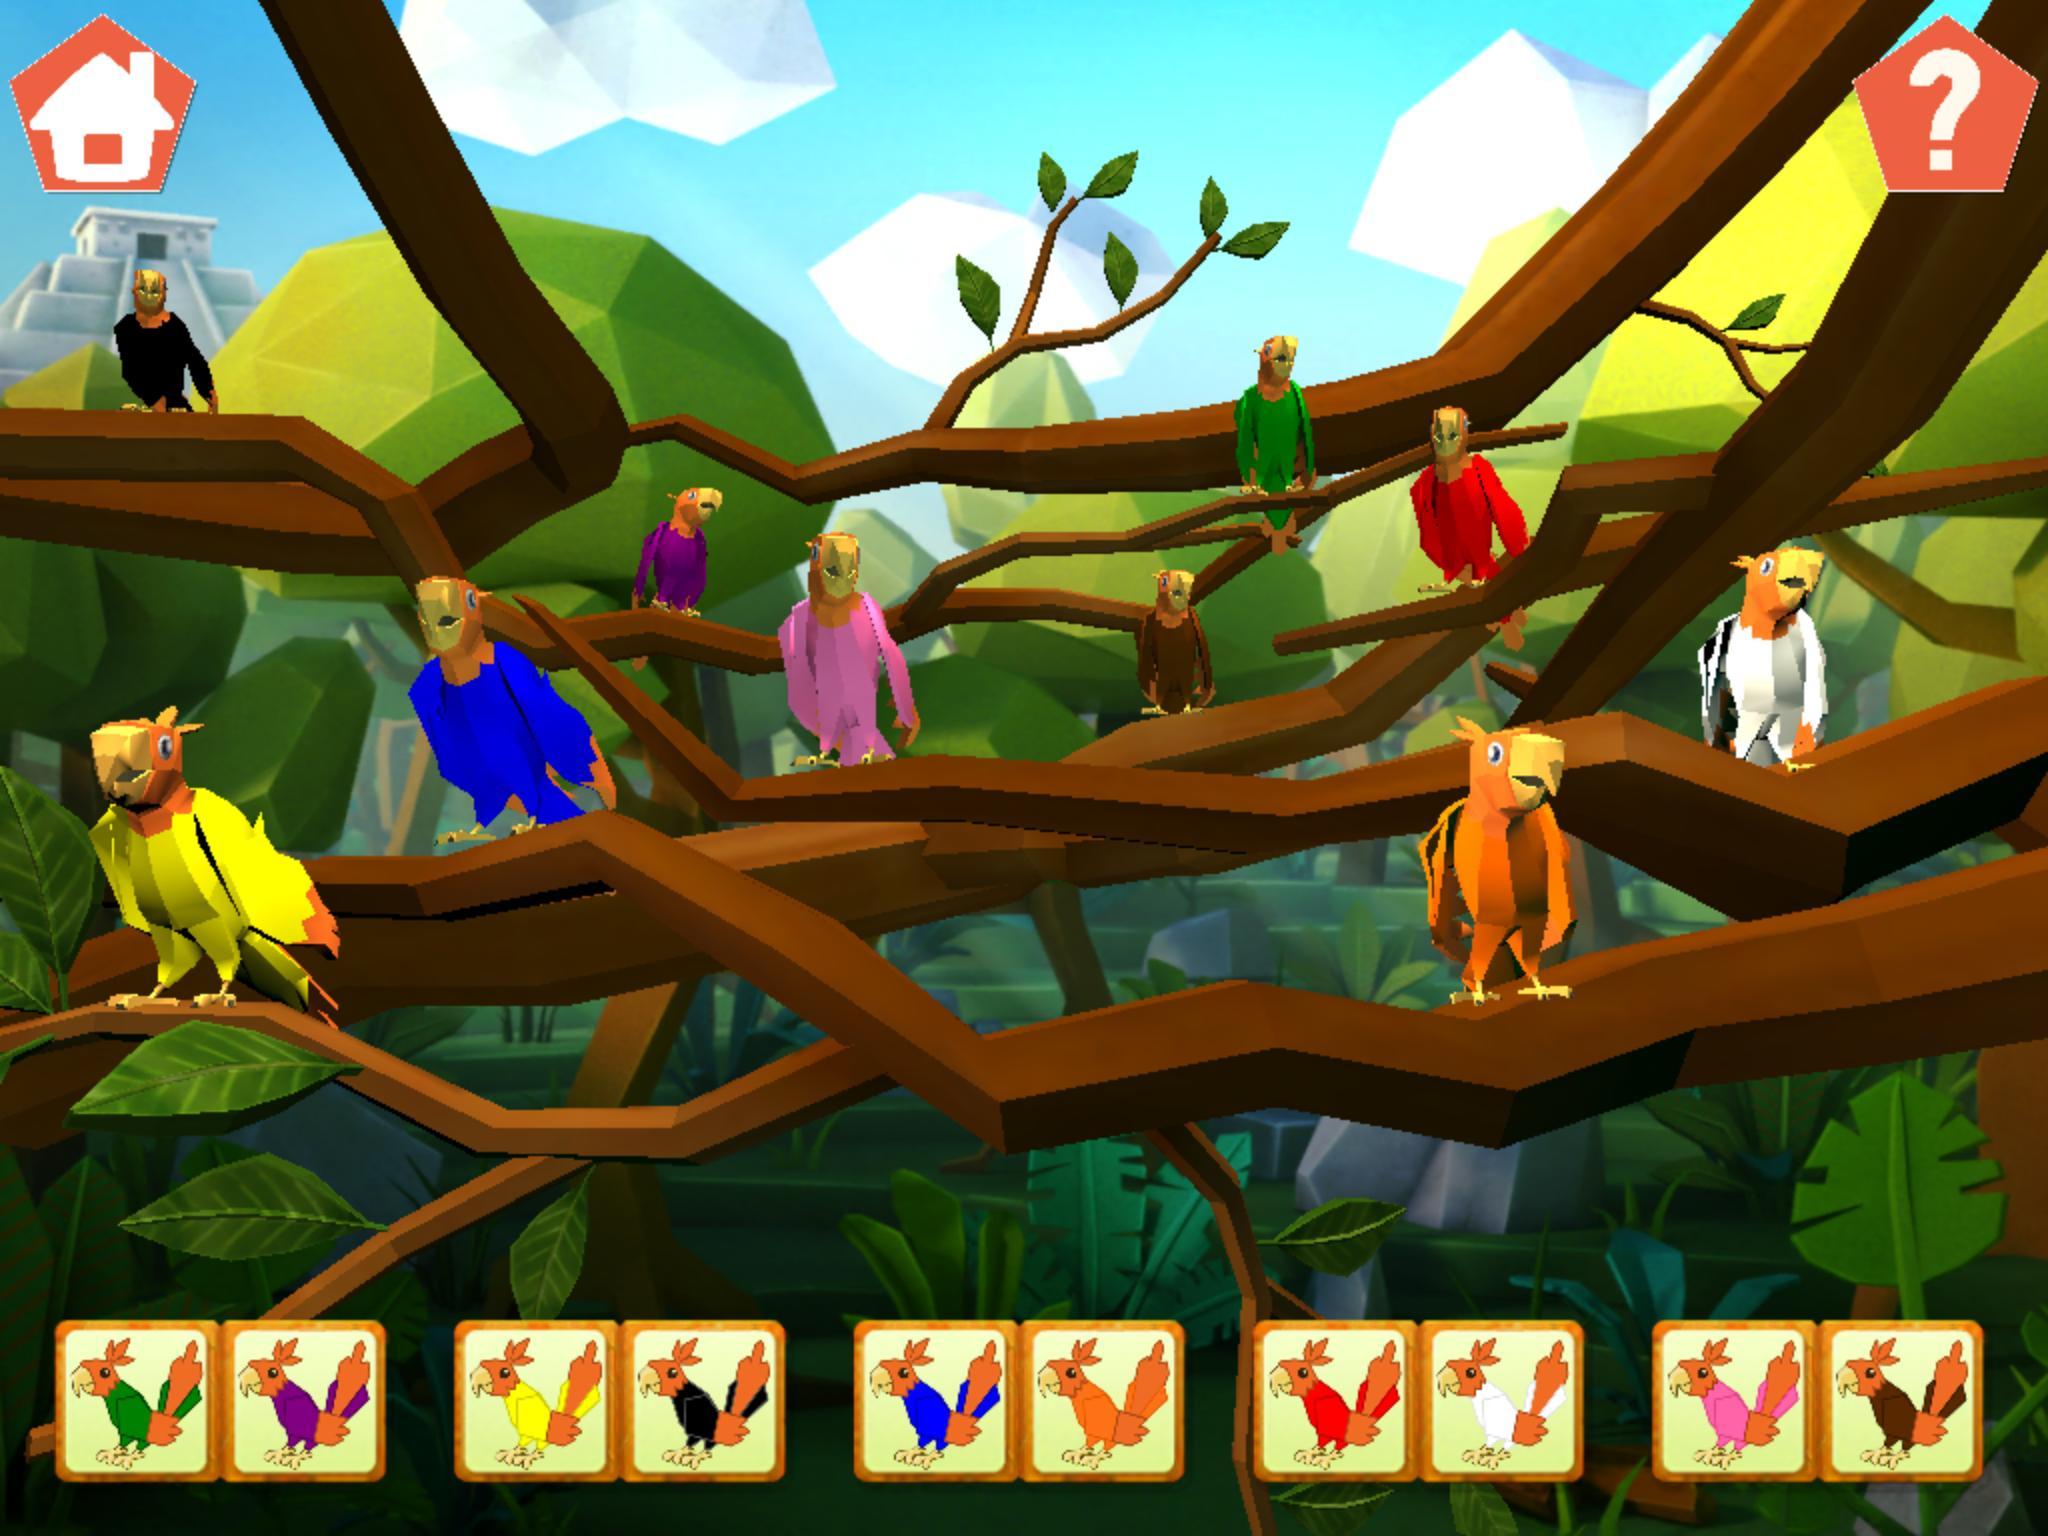 Jeu Maternelle Gratuit : Pokolpok For Android - Apk Download pour Jeux Maternelle Gratuit